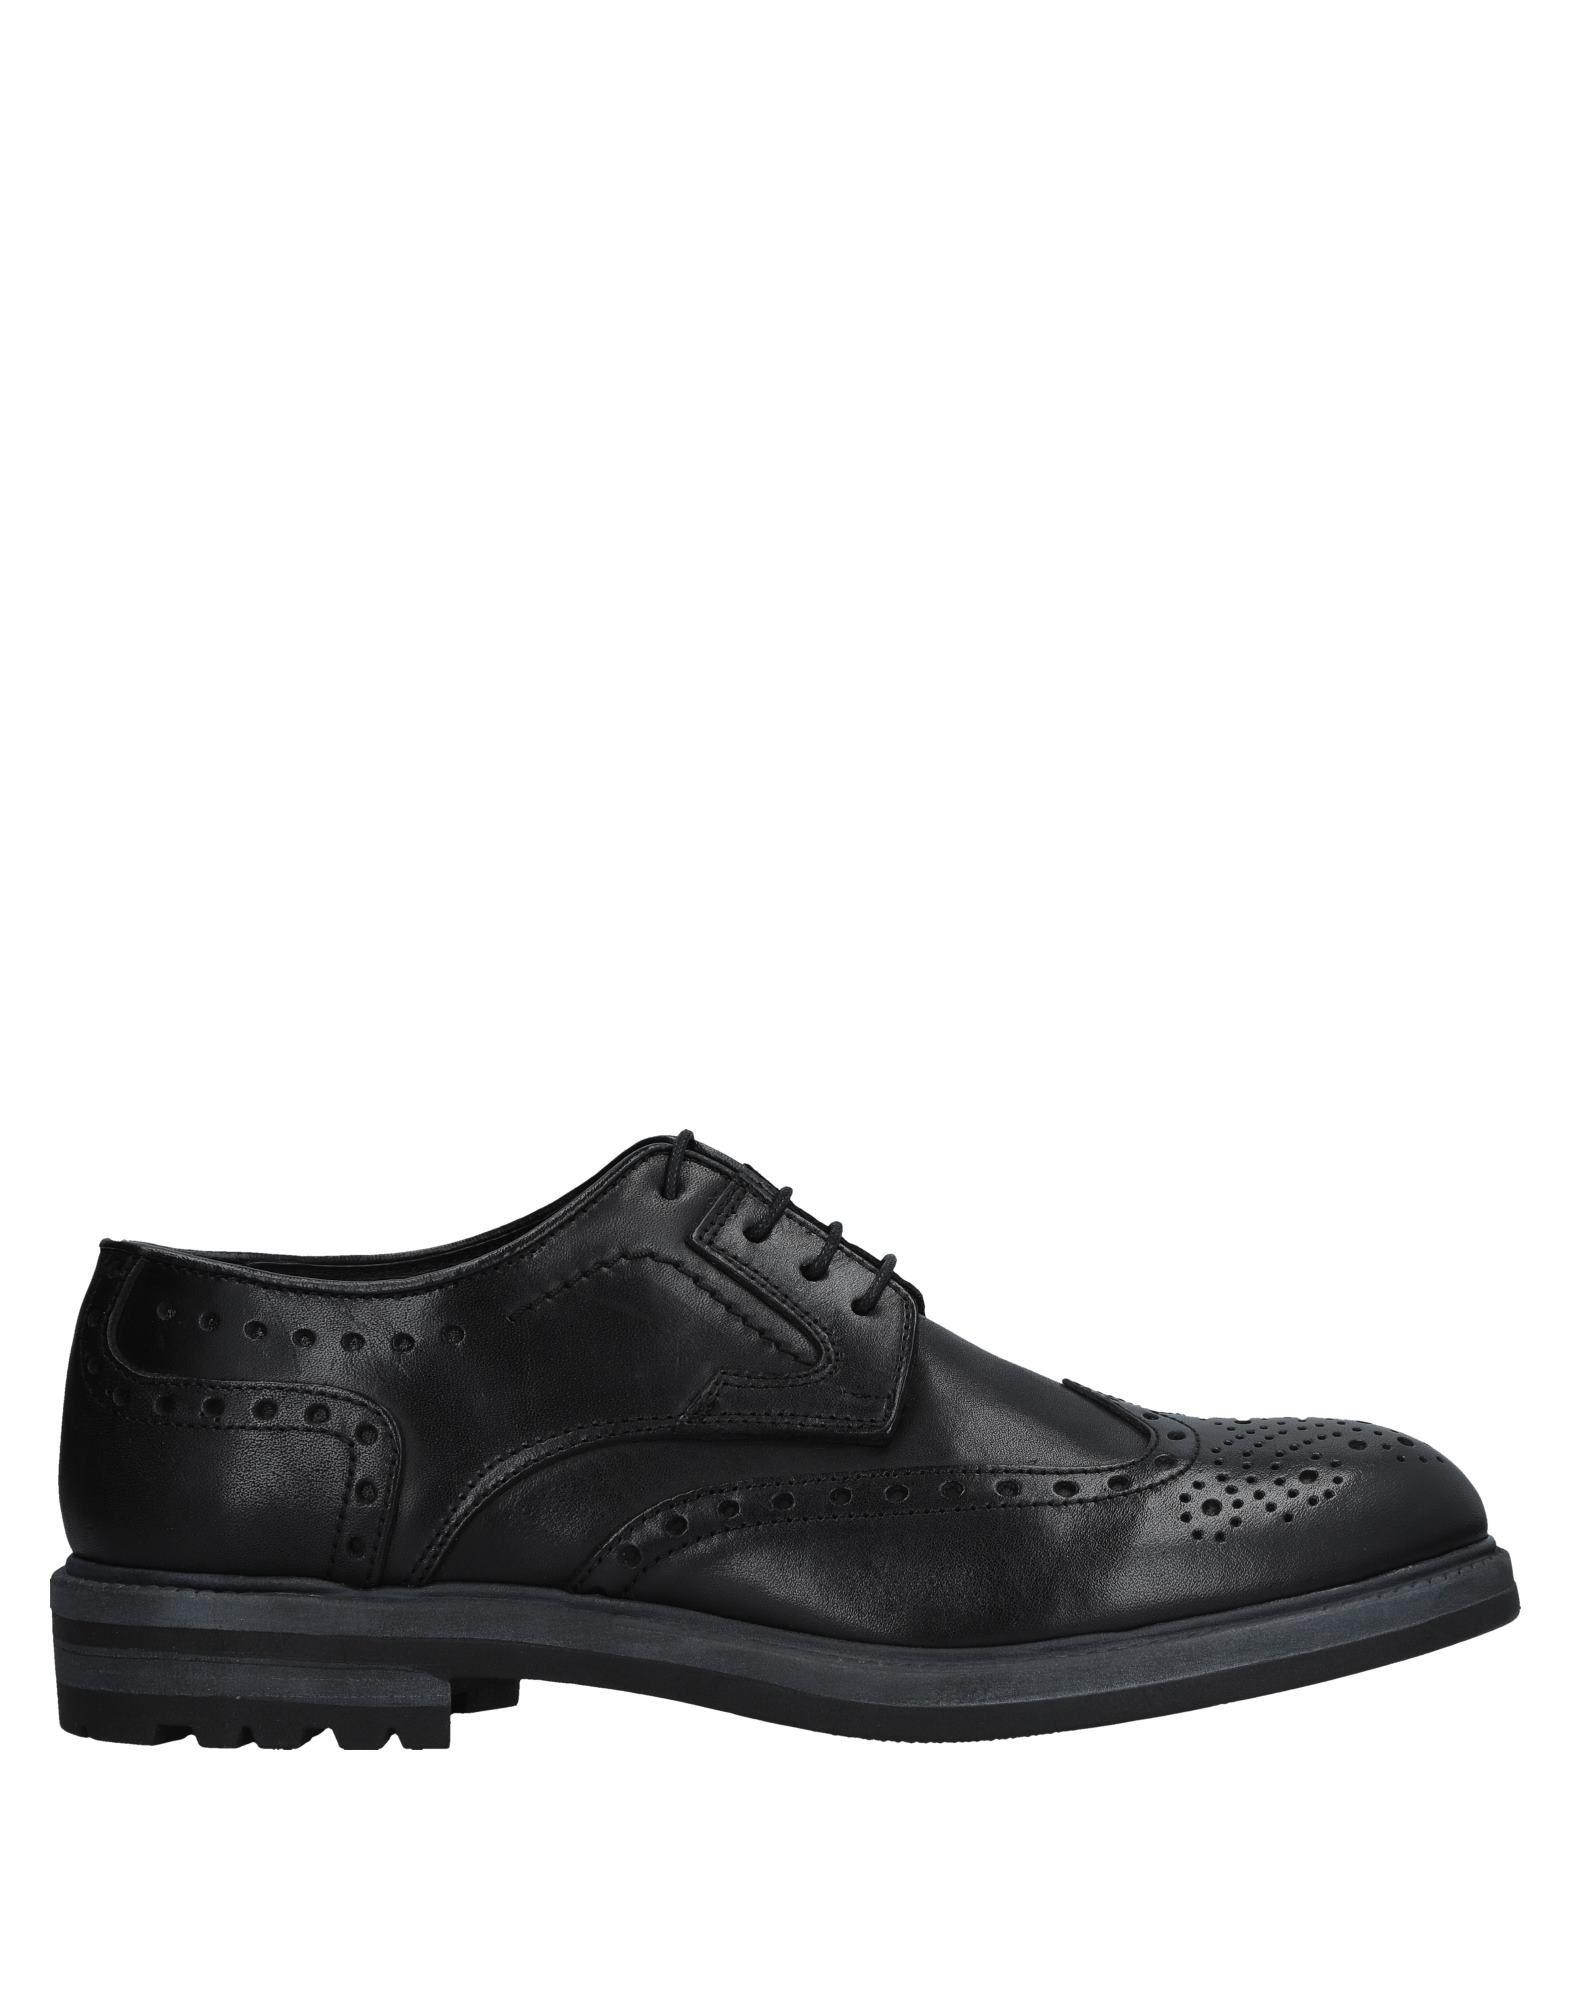 Rabatt echte Schuhe Snobs® Schnürschuhe Herren  11523690SR